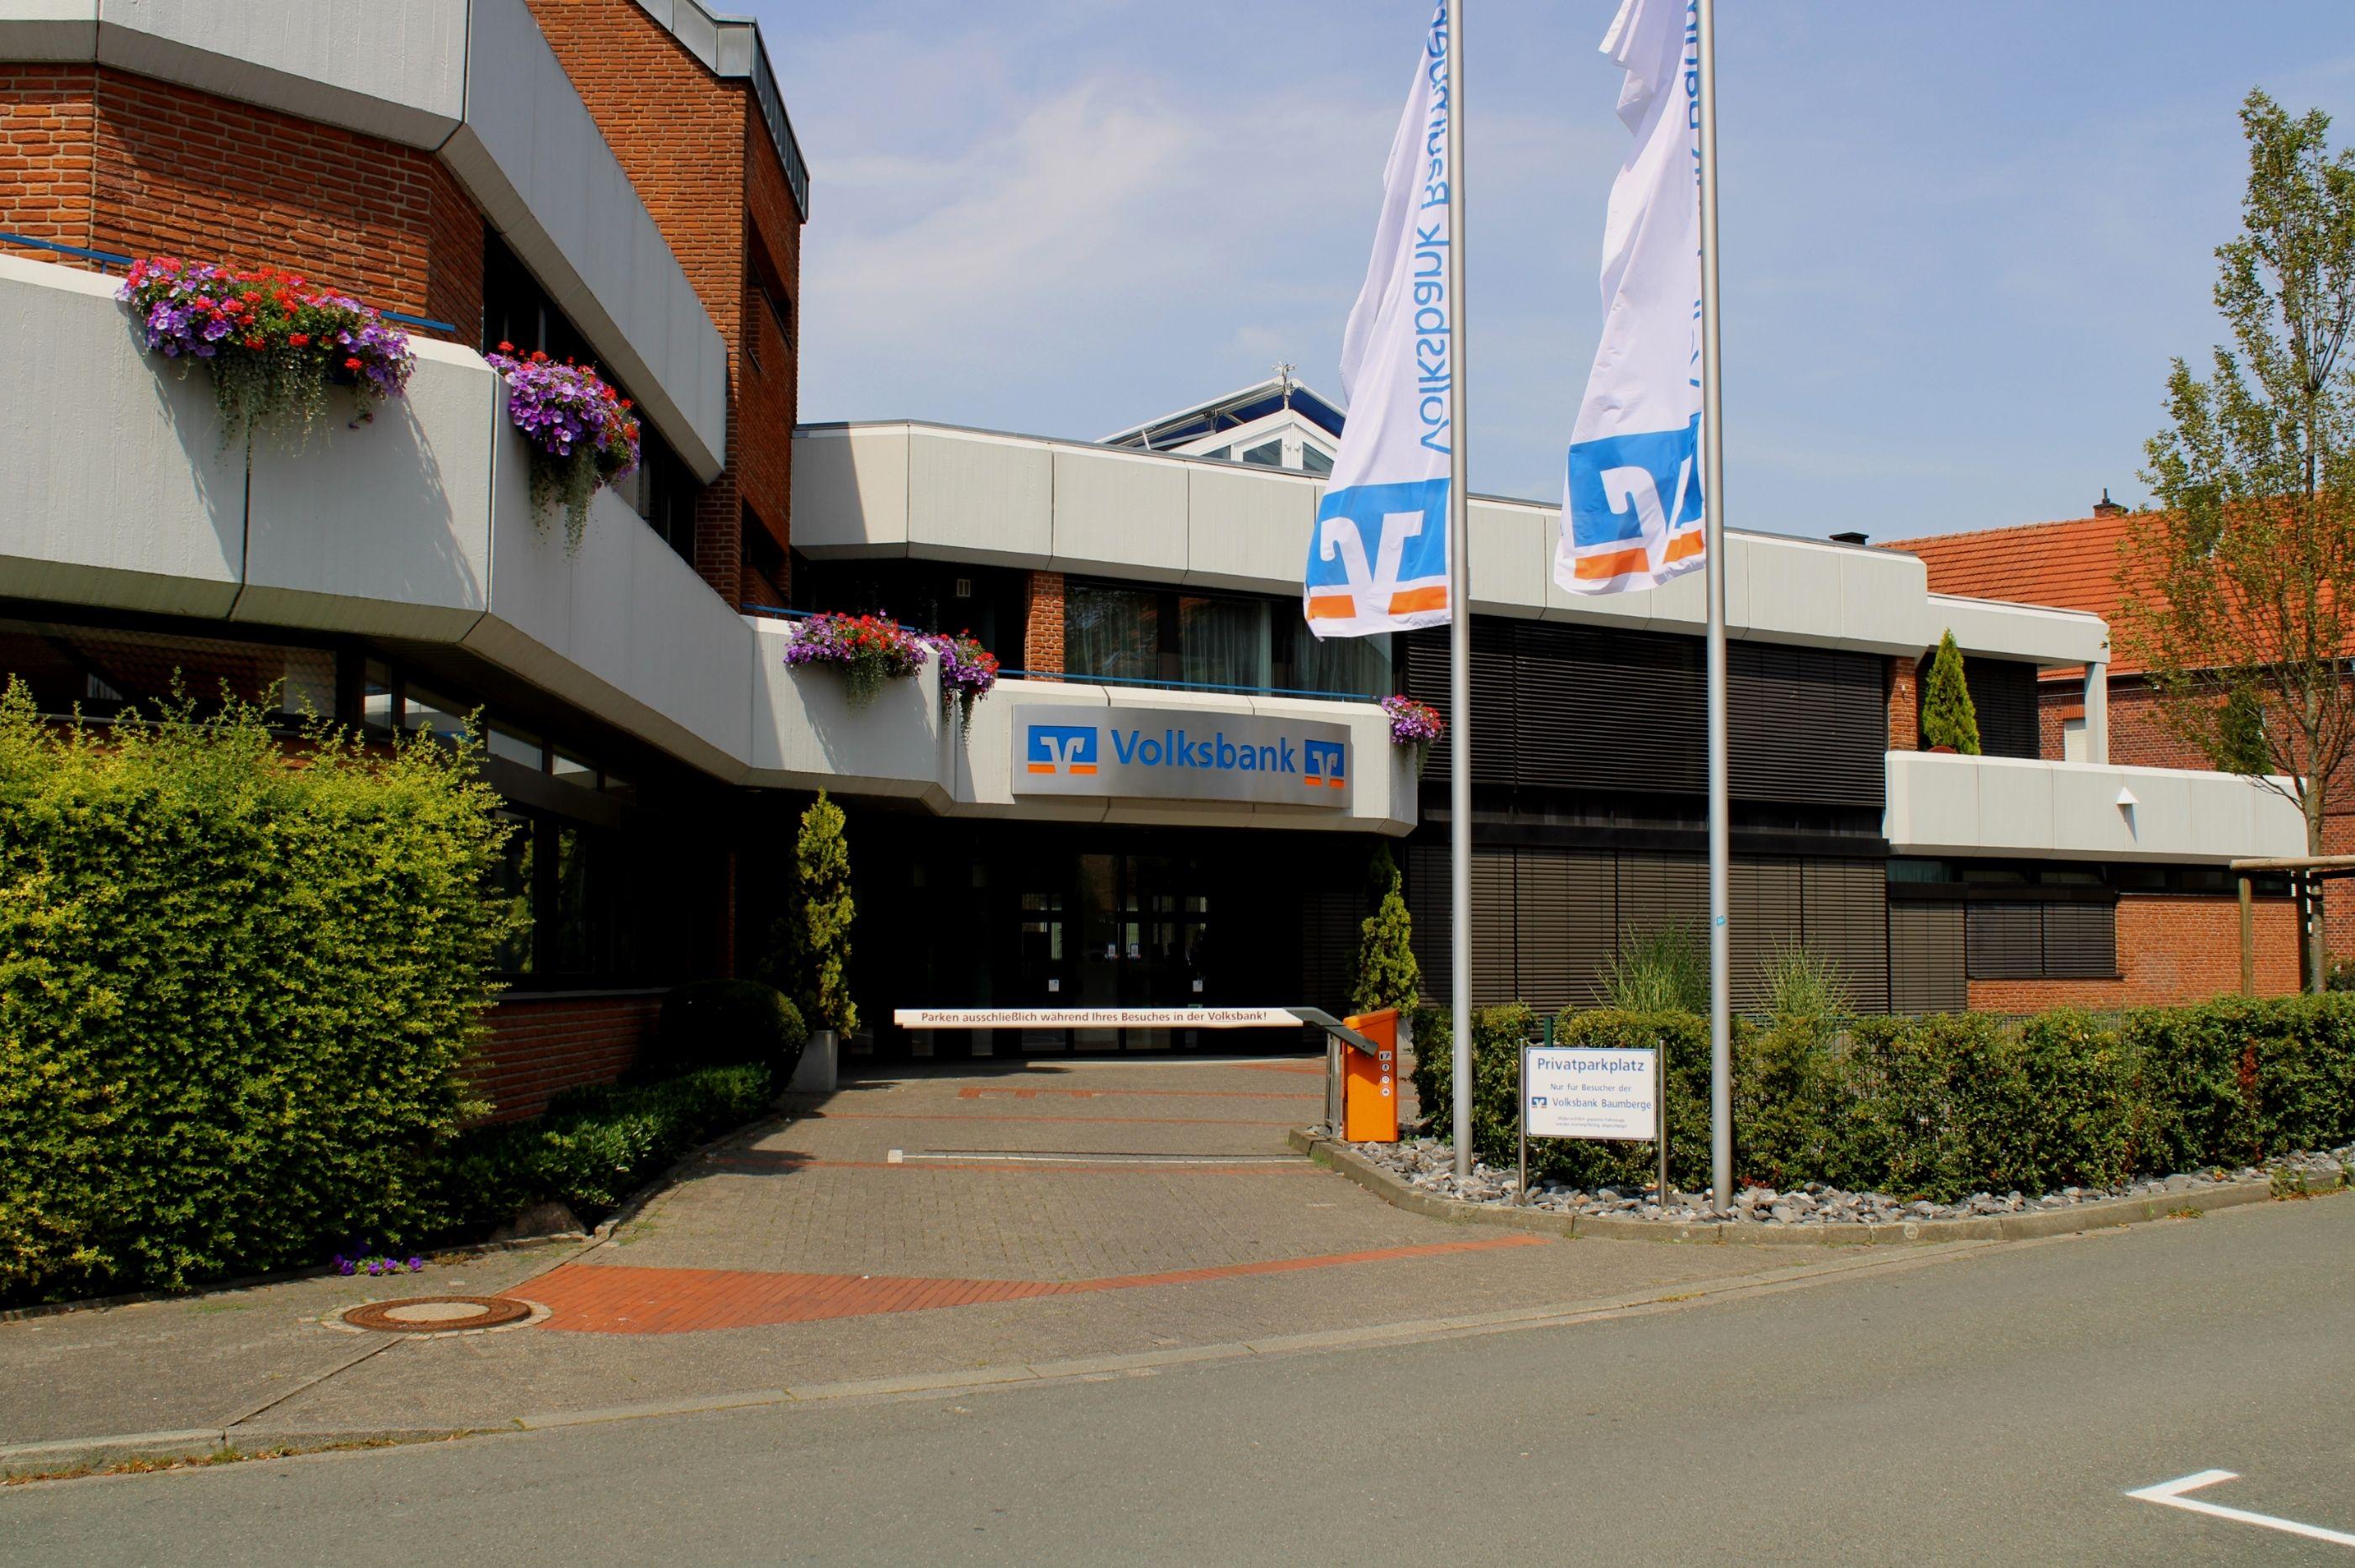 Volksbank Baumberge